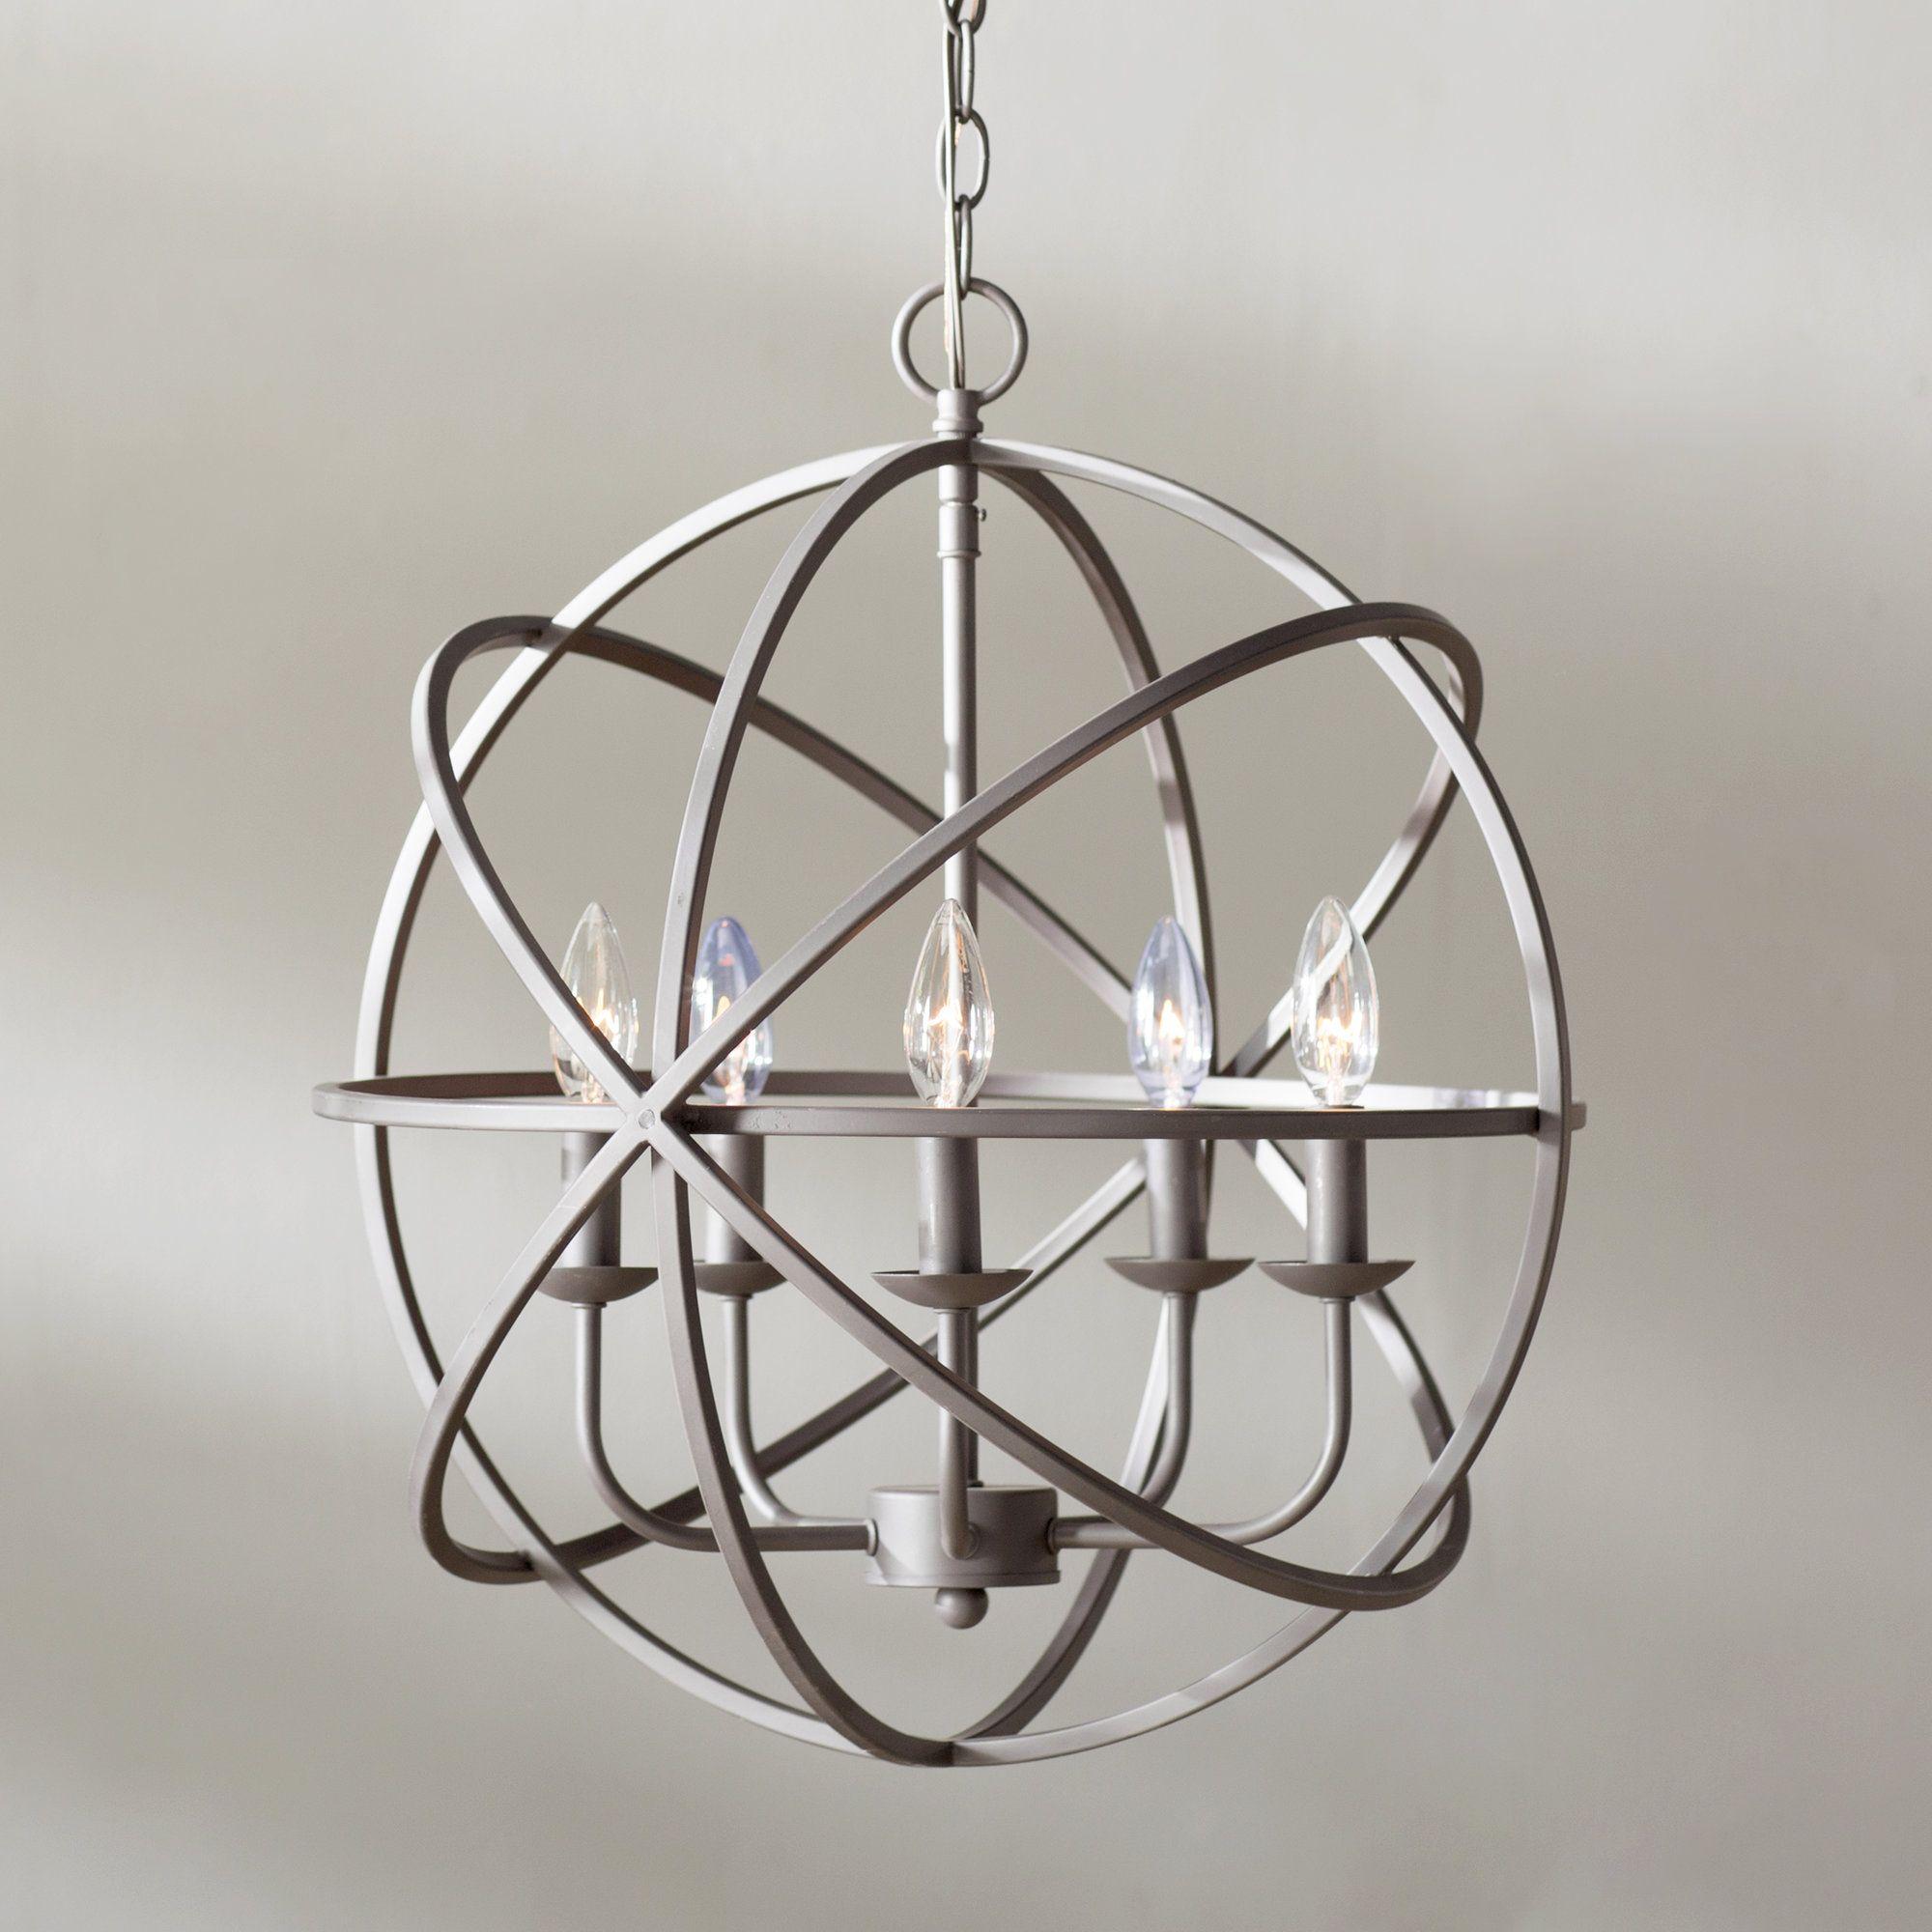 Hankinson 5light candle style globe chandelier in 2020